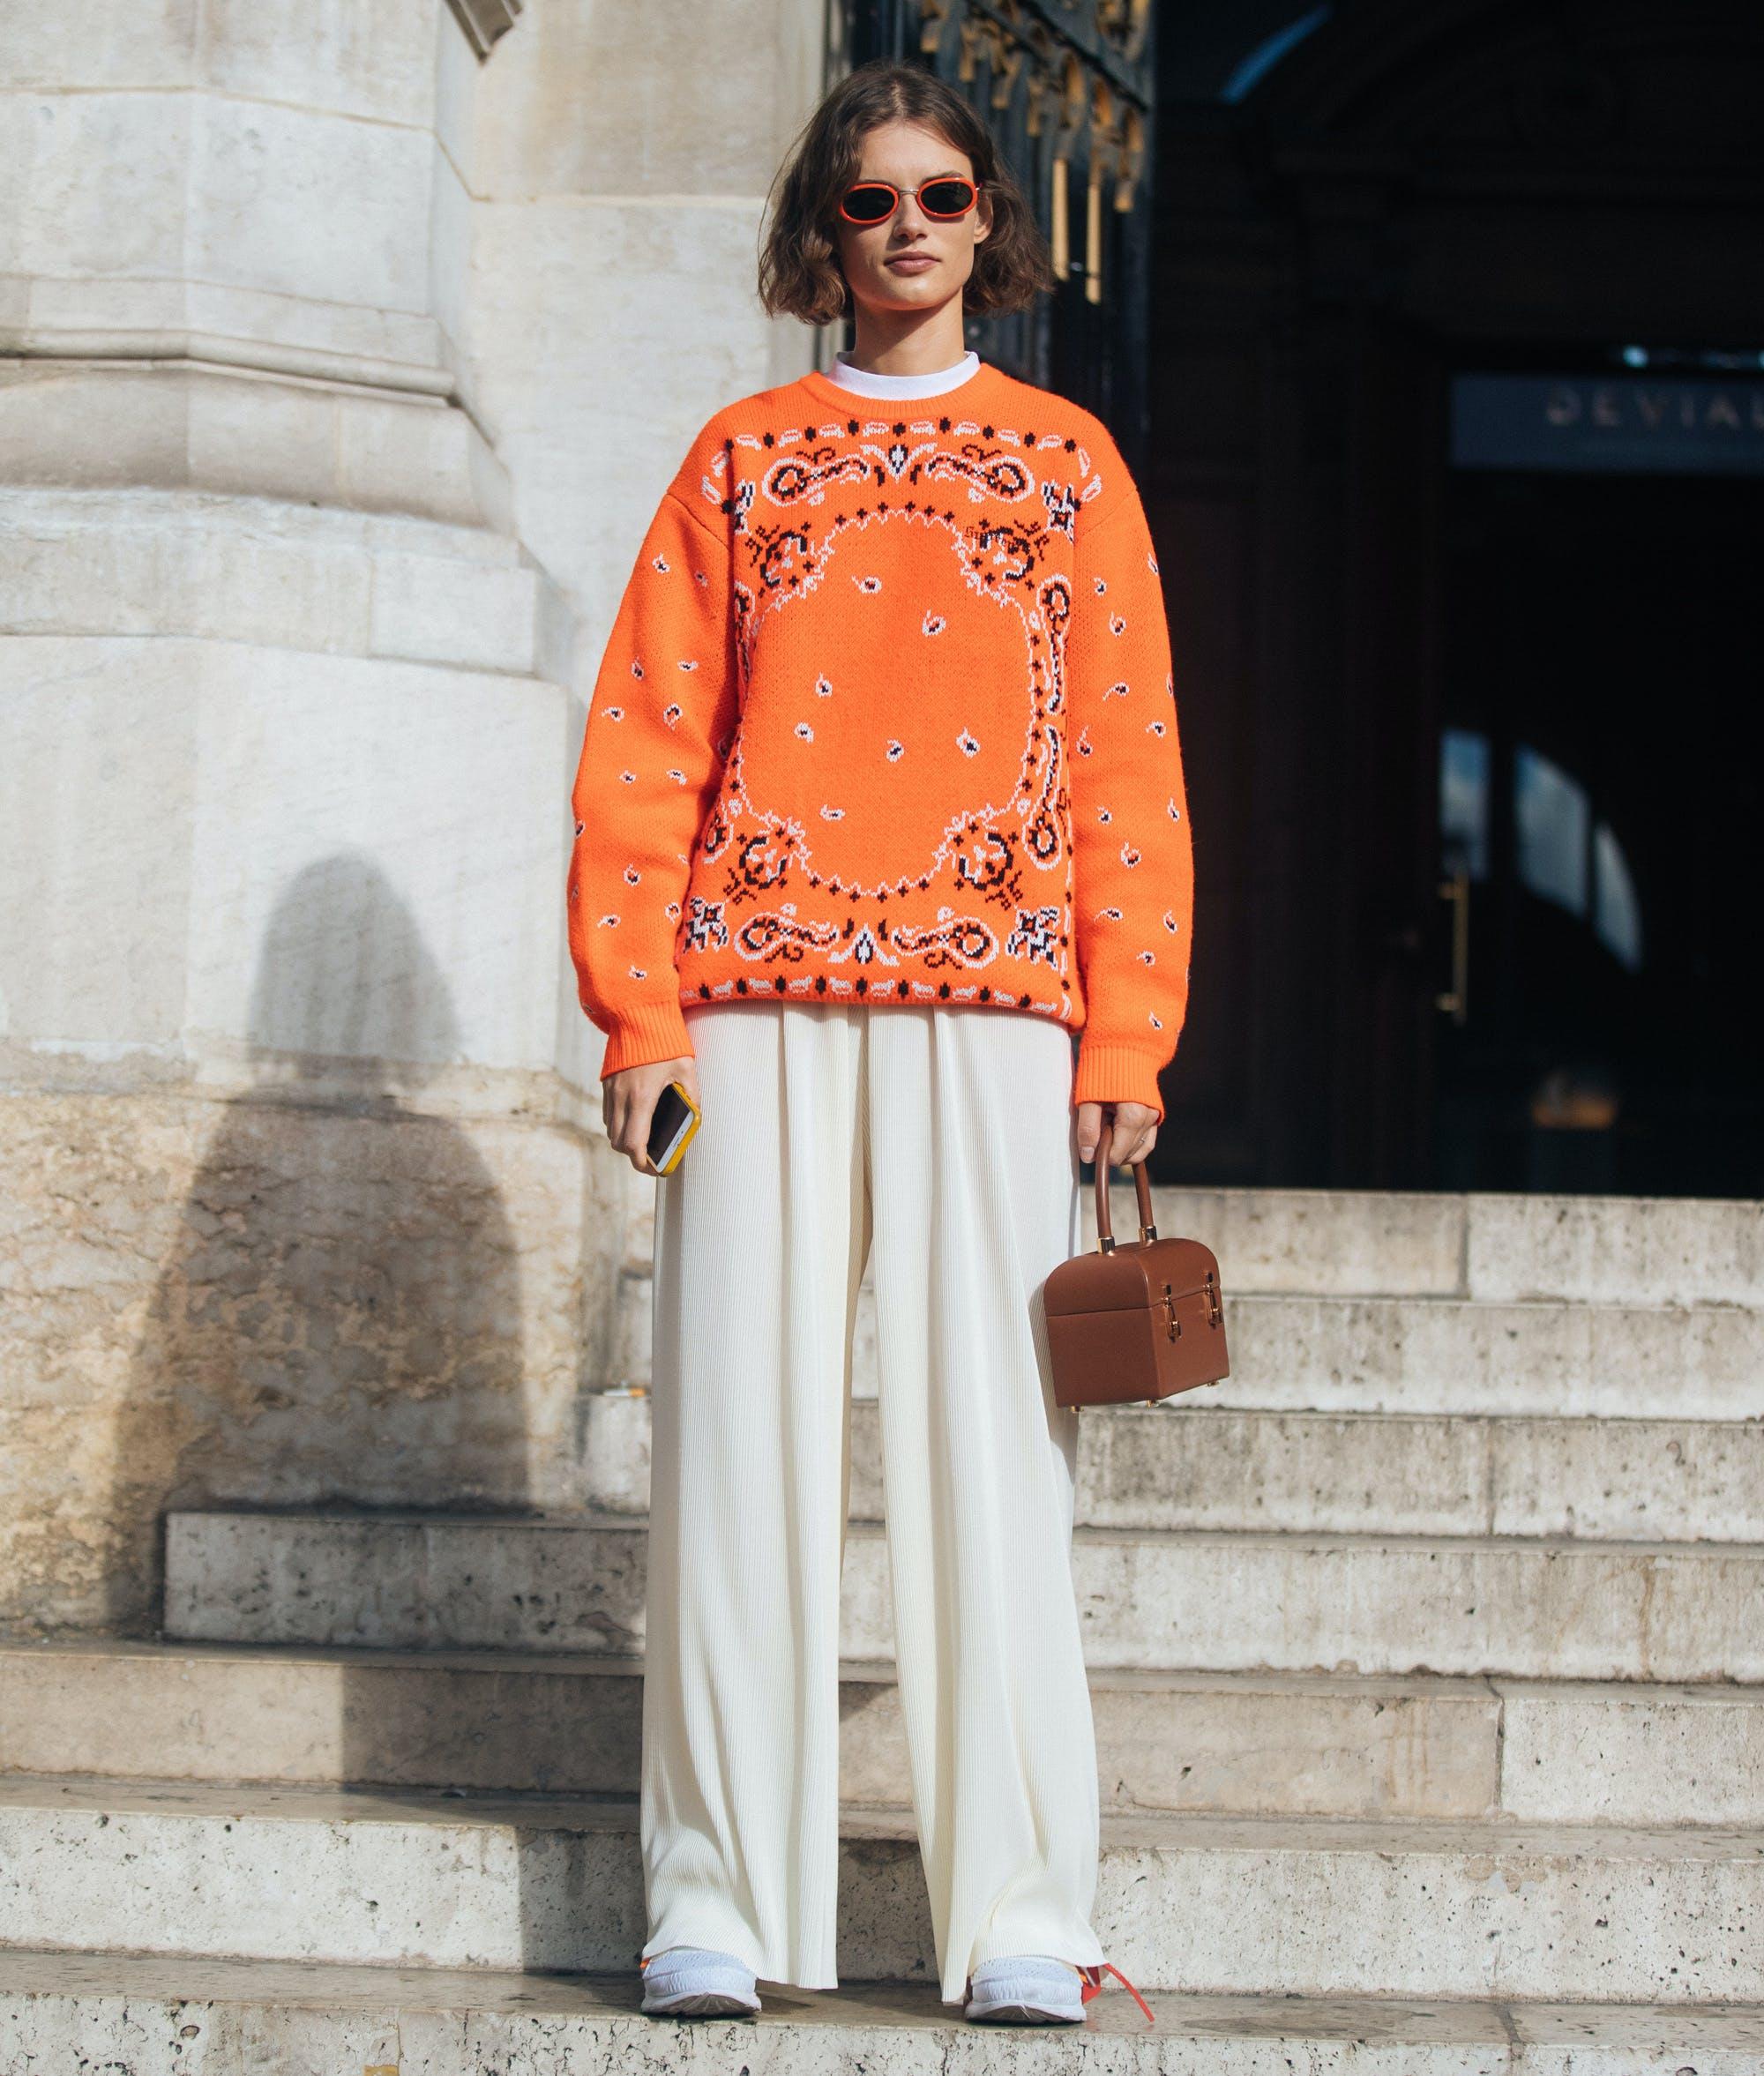 woman wearing neon orange and winter white